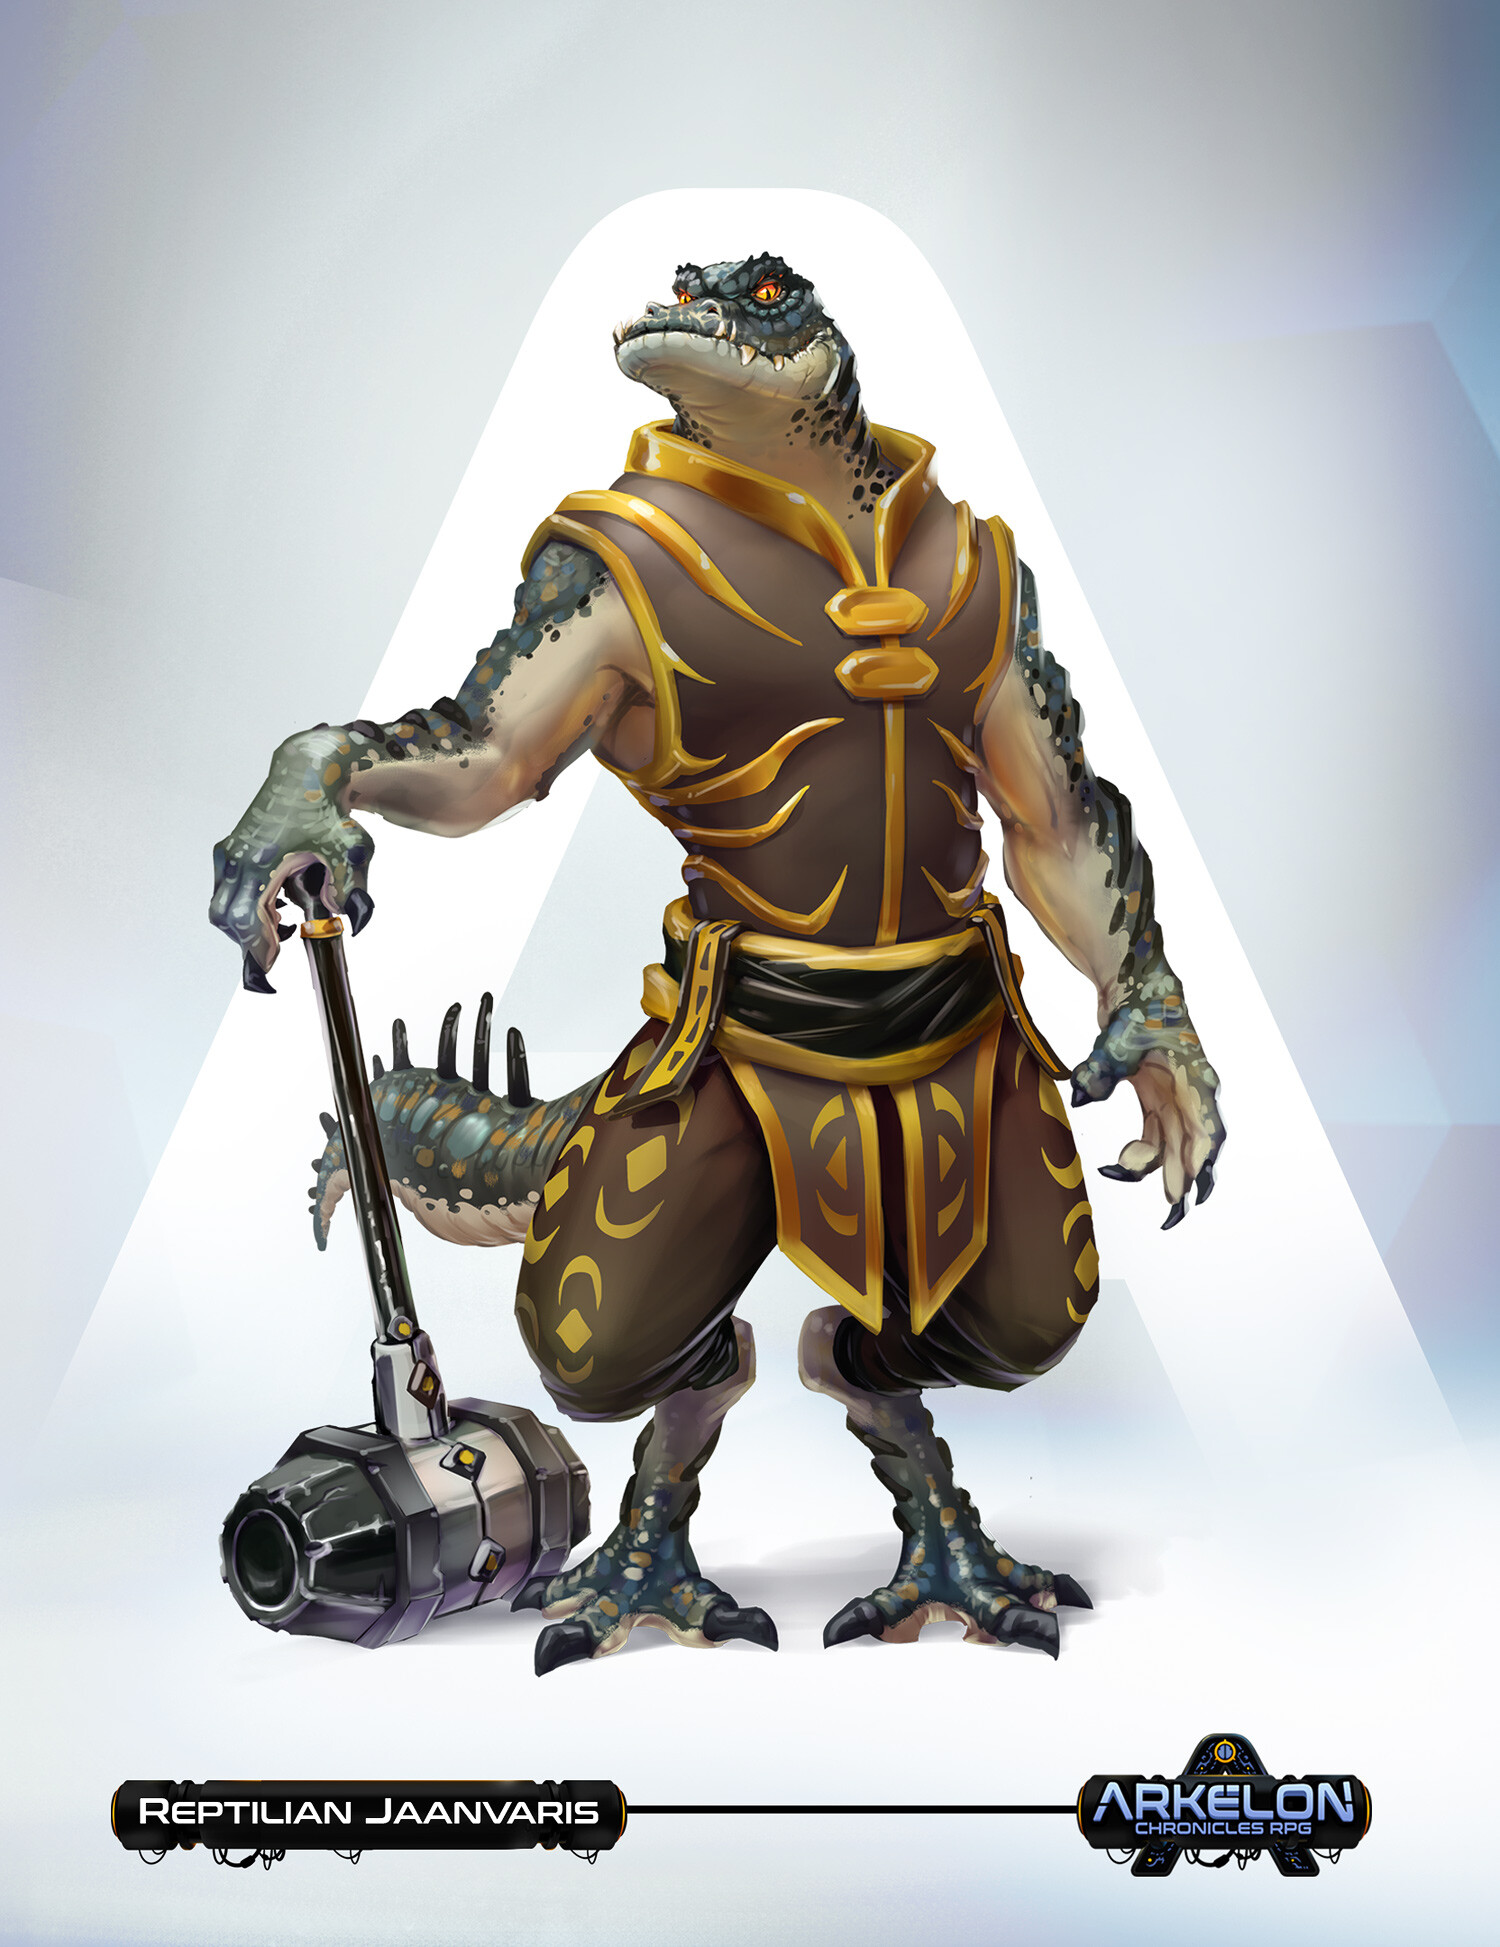 Jonas petrauskas port template reptilianjaanvaris